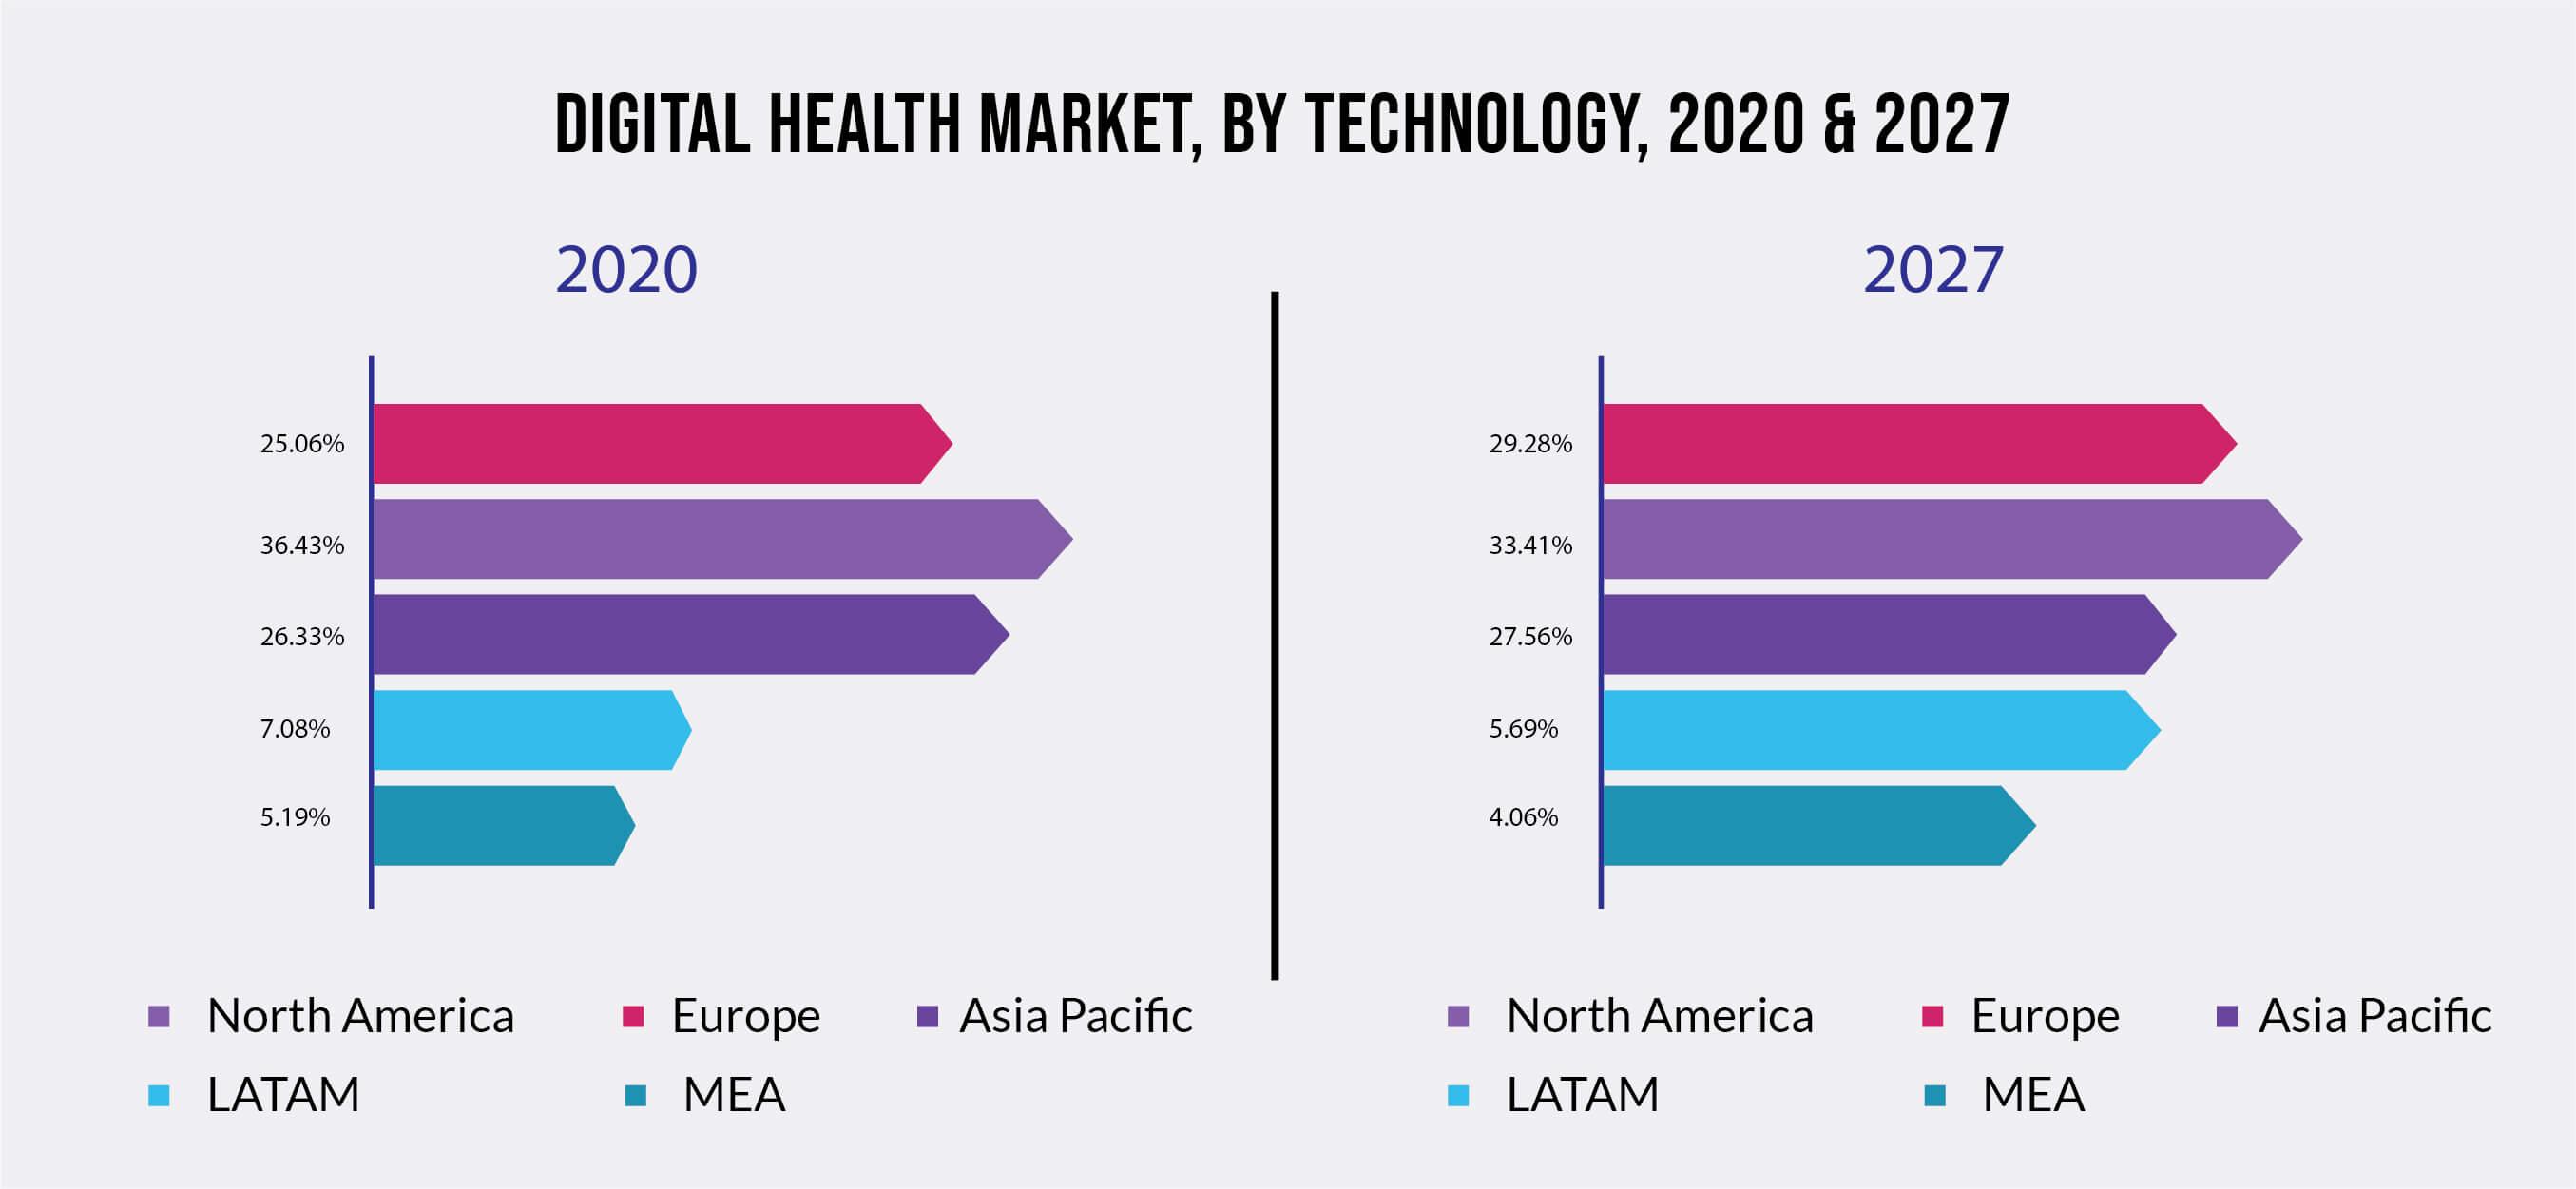 Digital Health Market, By Technology, 2020 & 2027